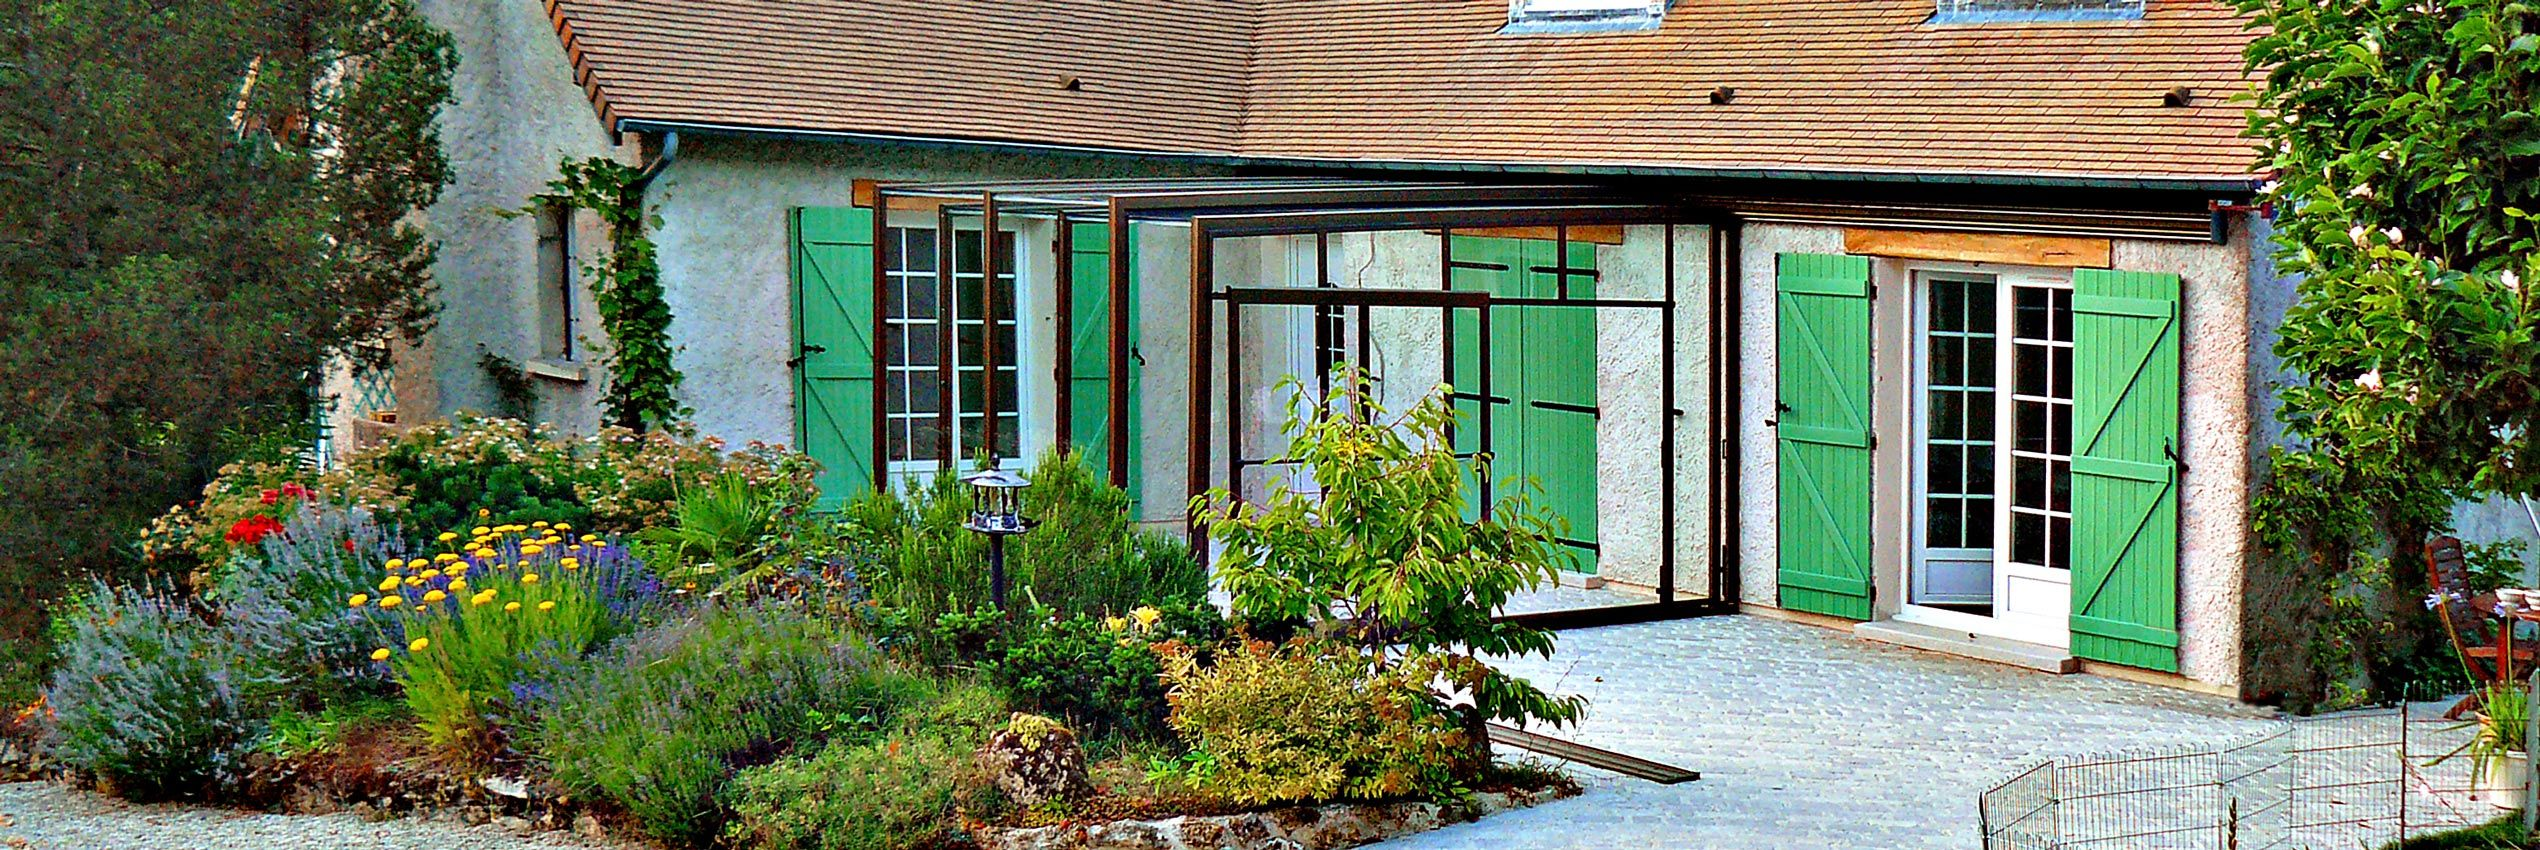 Abri Veranda Pour Spa abris de terrasse - modelles de alukov | alukov.fr